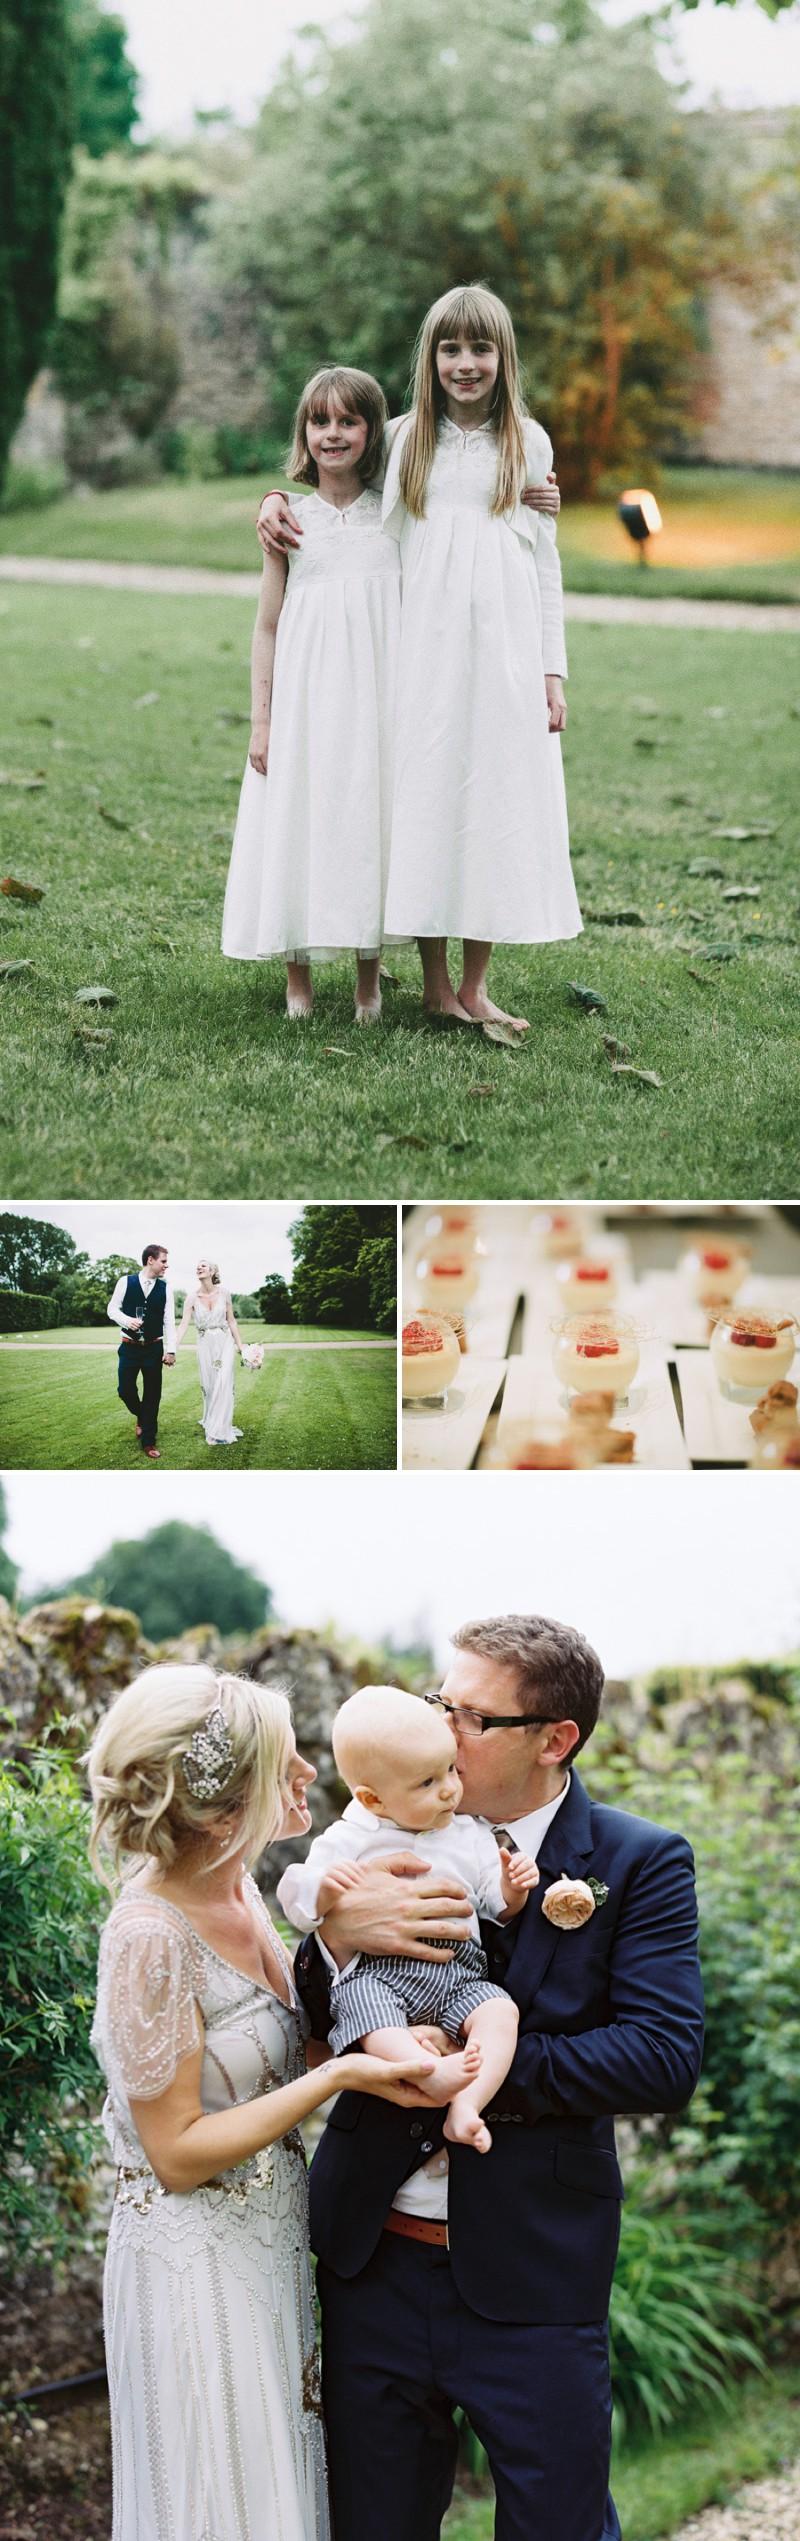 Eden Wedding Dresses 50 Stunning An English Country Garden